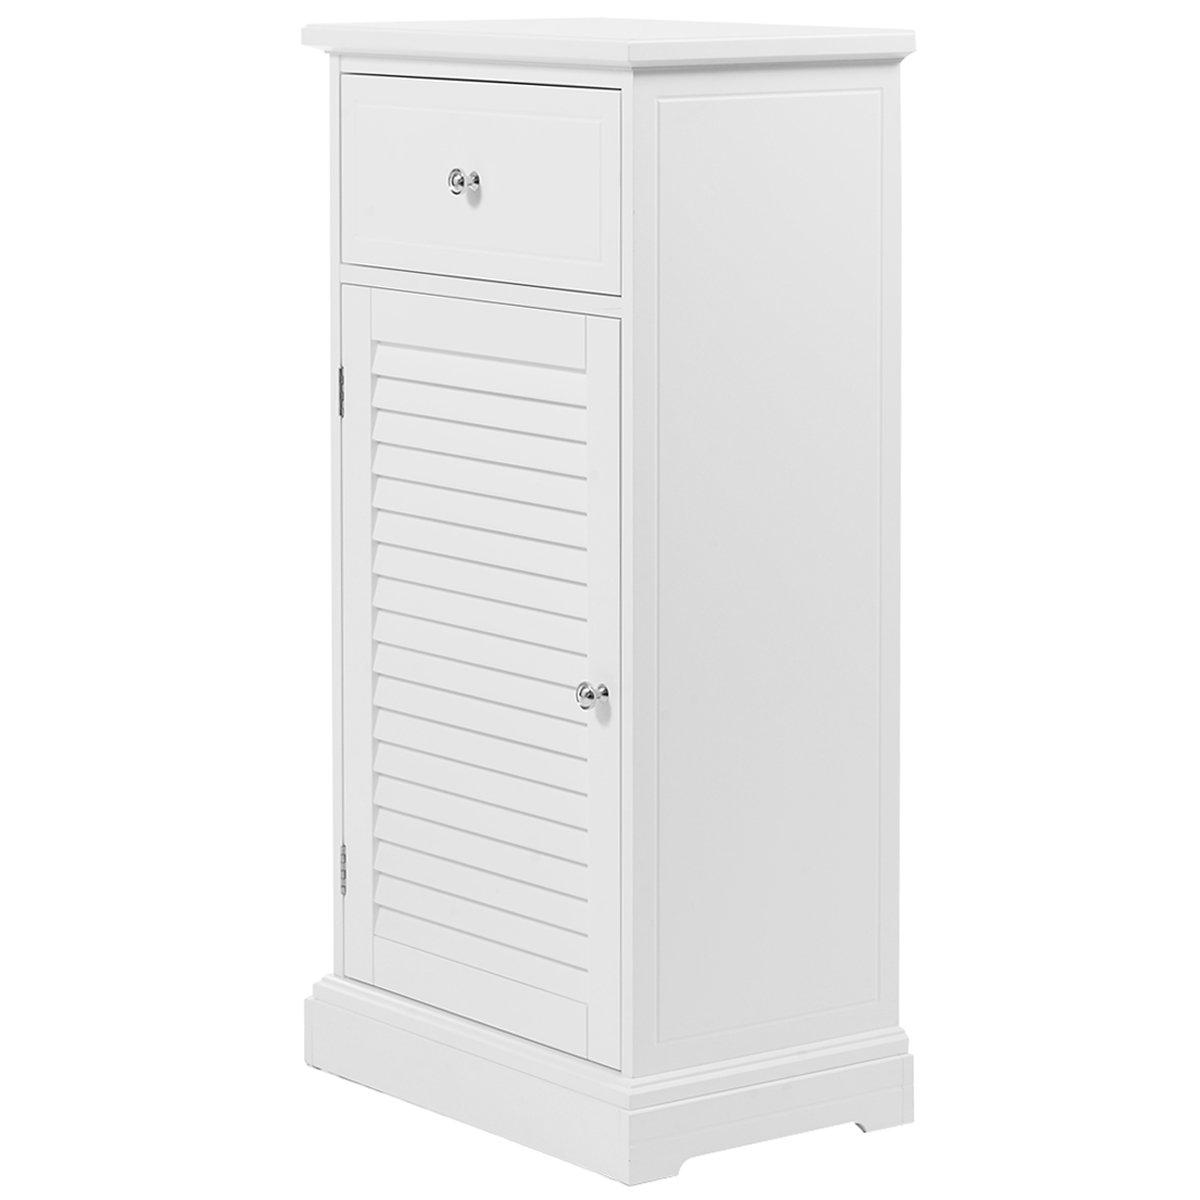 Giantex White Storage Floor Cabinet Wall Shutter Door Bathroom Organizer Cupboard Shelf